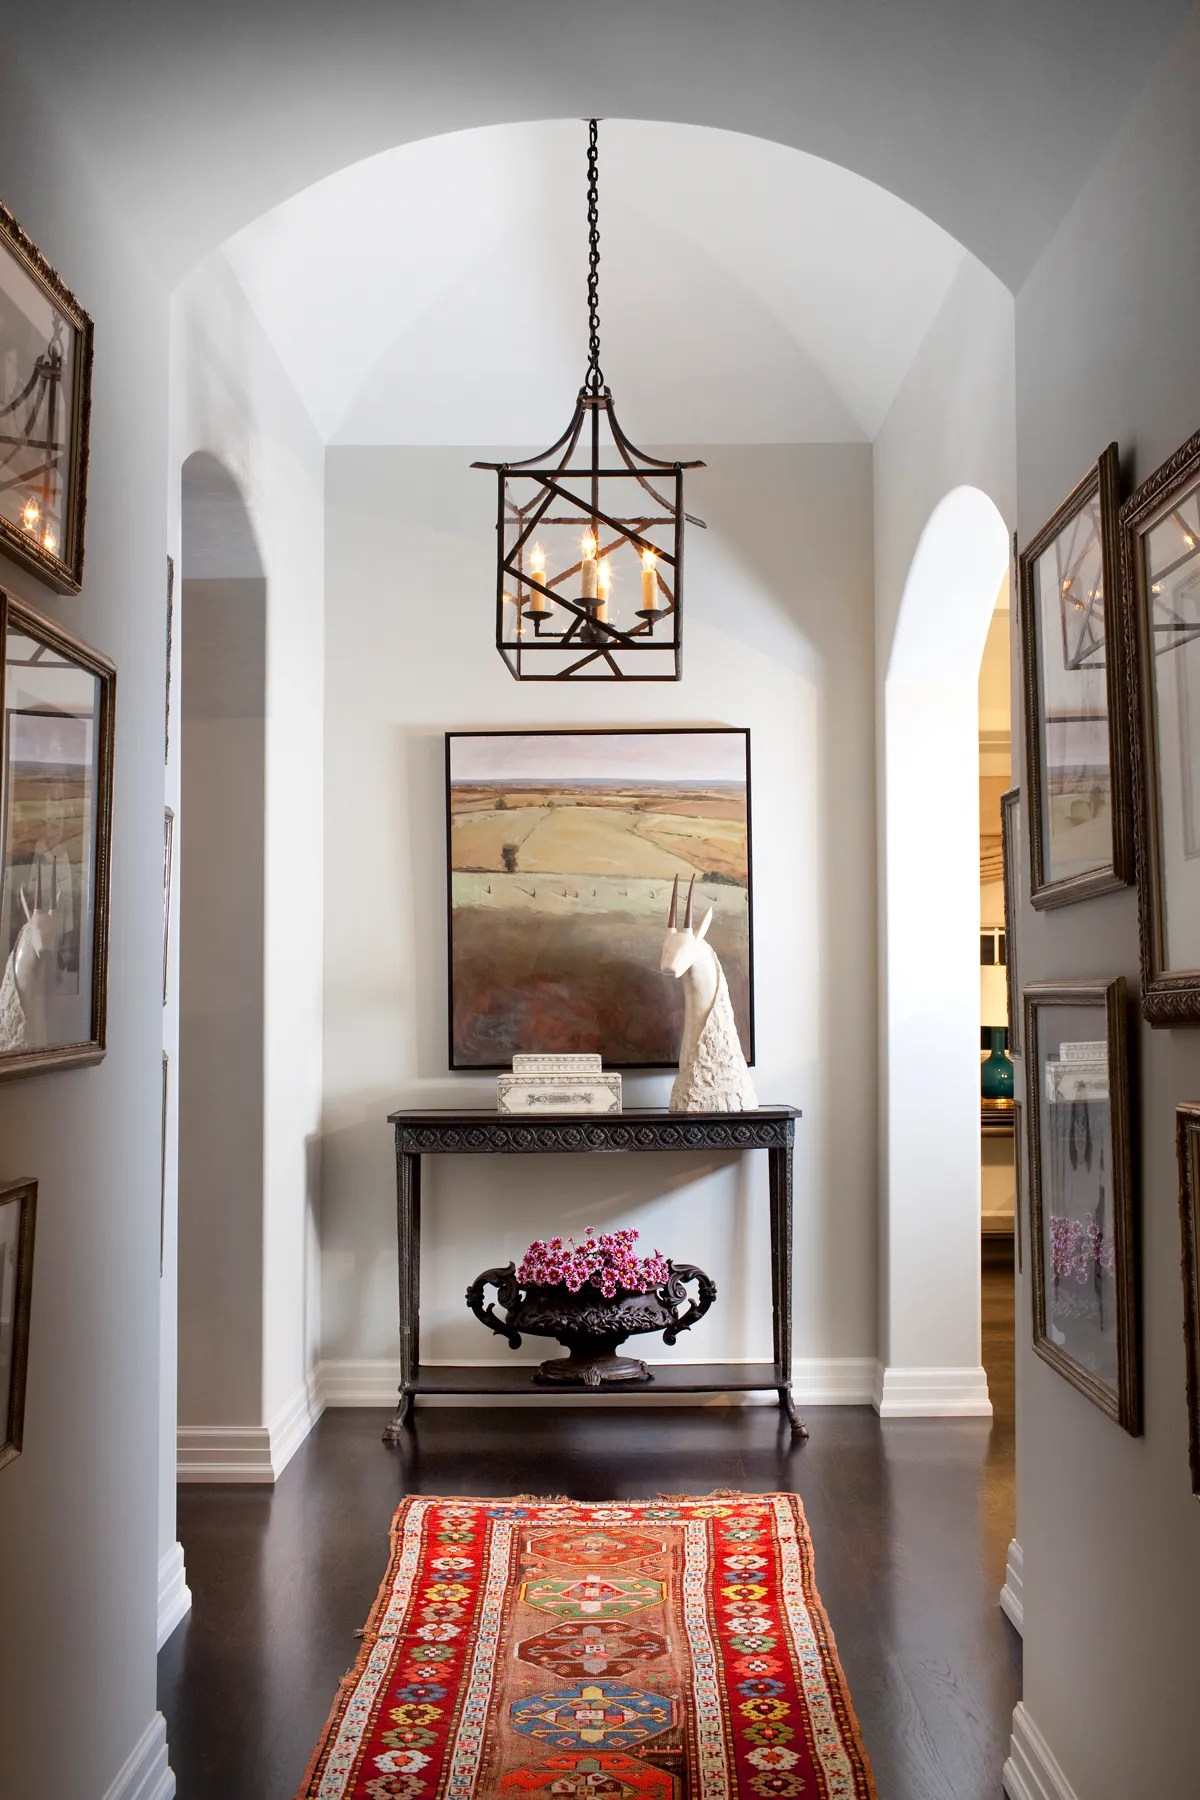 Creative of turquoise bedroom decor turquoise bedroom. Corner Decoration Ideas: How to Reimagine Overlooked